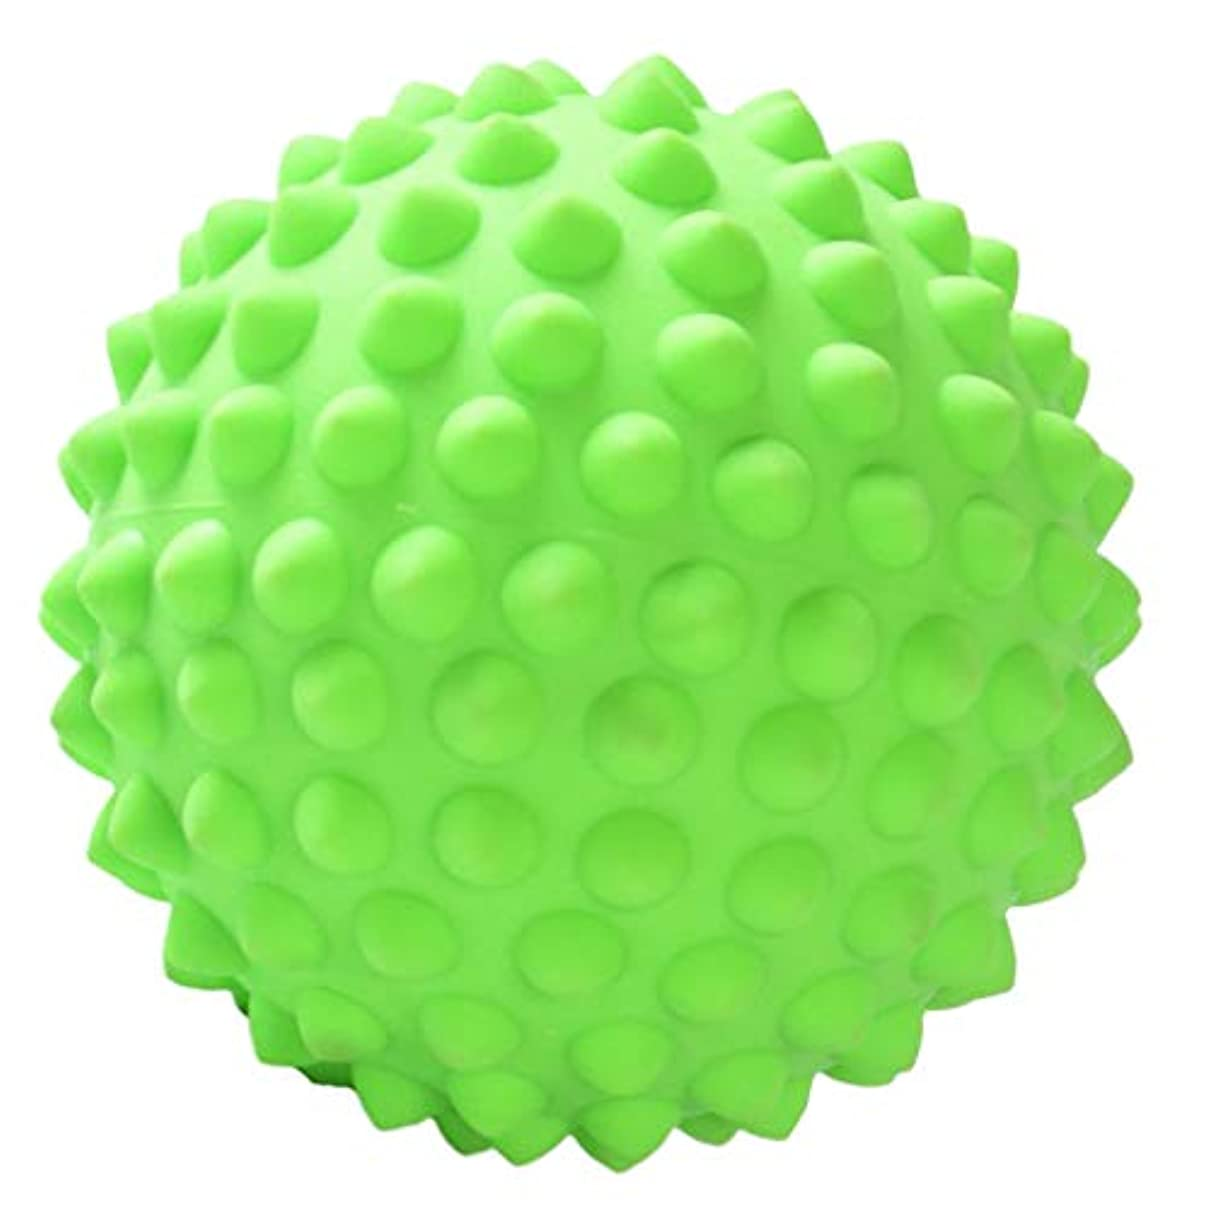 Baoblaze マッサージボール 約9 cm ツボ押し ジム オフィス 自宅用 3色選べ - 緑, 説明のとおり